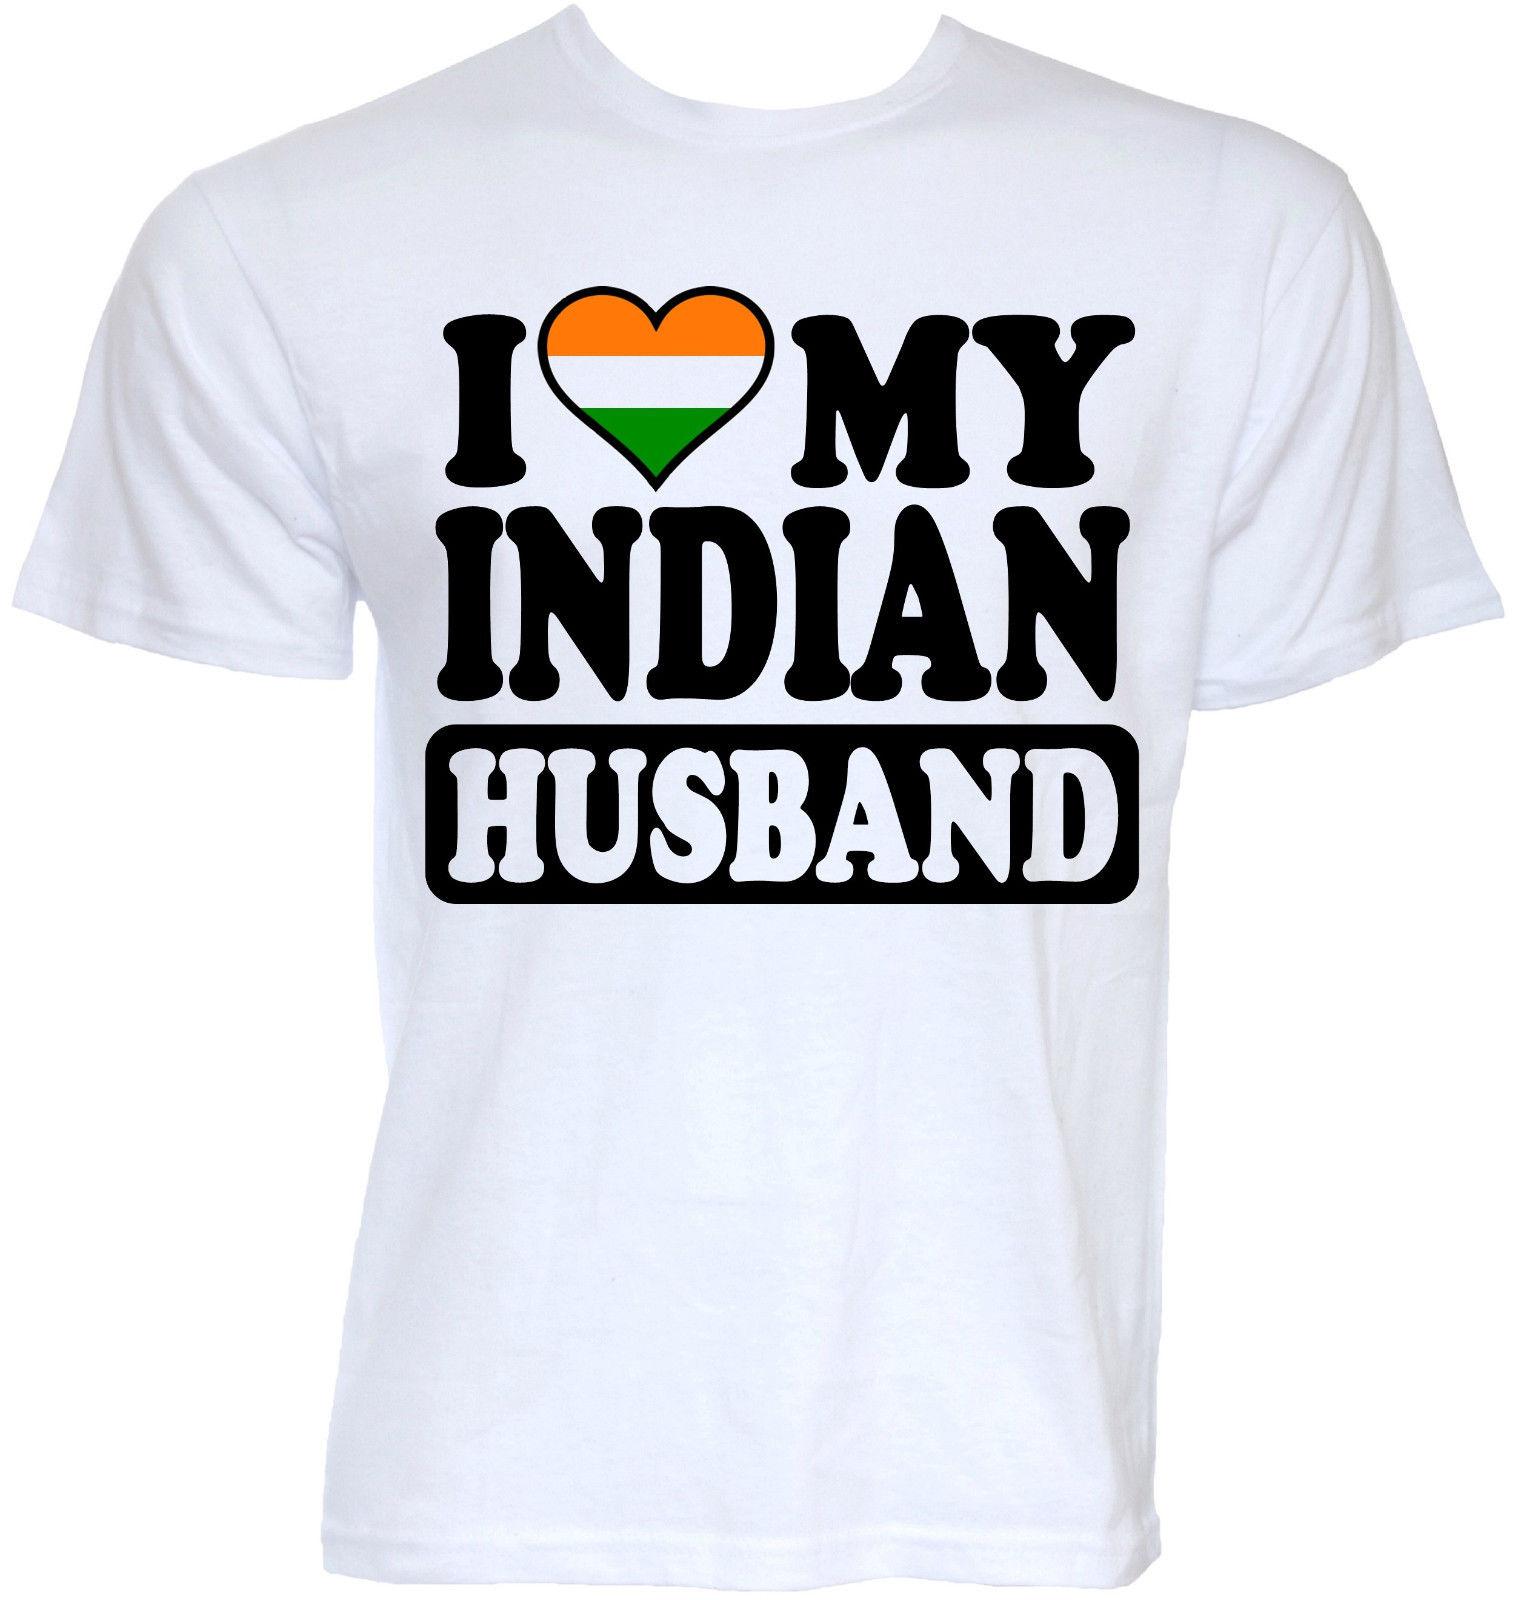 MENS FUNNY COOL NOVELTY INDIAN HUSBAND INDIA FLAG T-SHIRTS JOKE GIFTS PRESENTS Short Sleeve Discount 100 % Cotton T Shirts